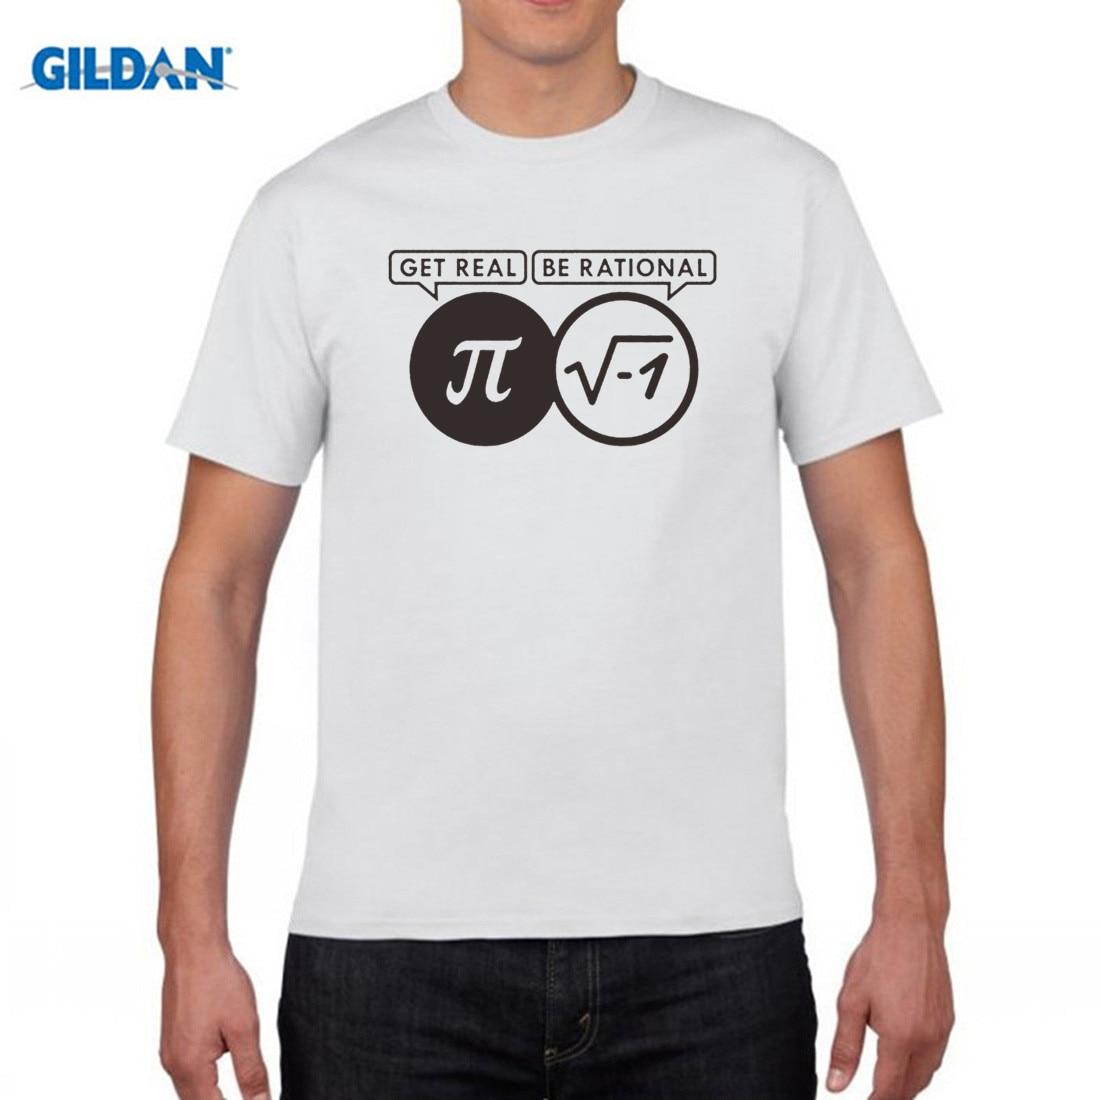 GILDAN 2017 Be Rational Get Real Nerdy Geek Pi Nerd T Shirts Men Cool Math Nerd T Shirts Fashion Funny Men T-shirts